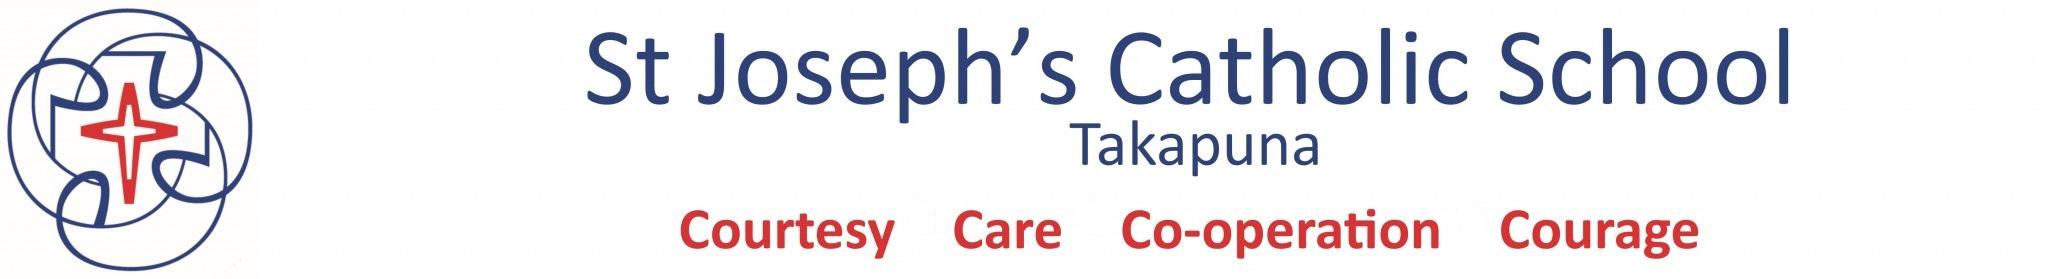 St Joseph's Catholic School Takapuna Logo